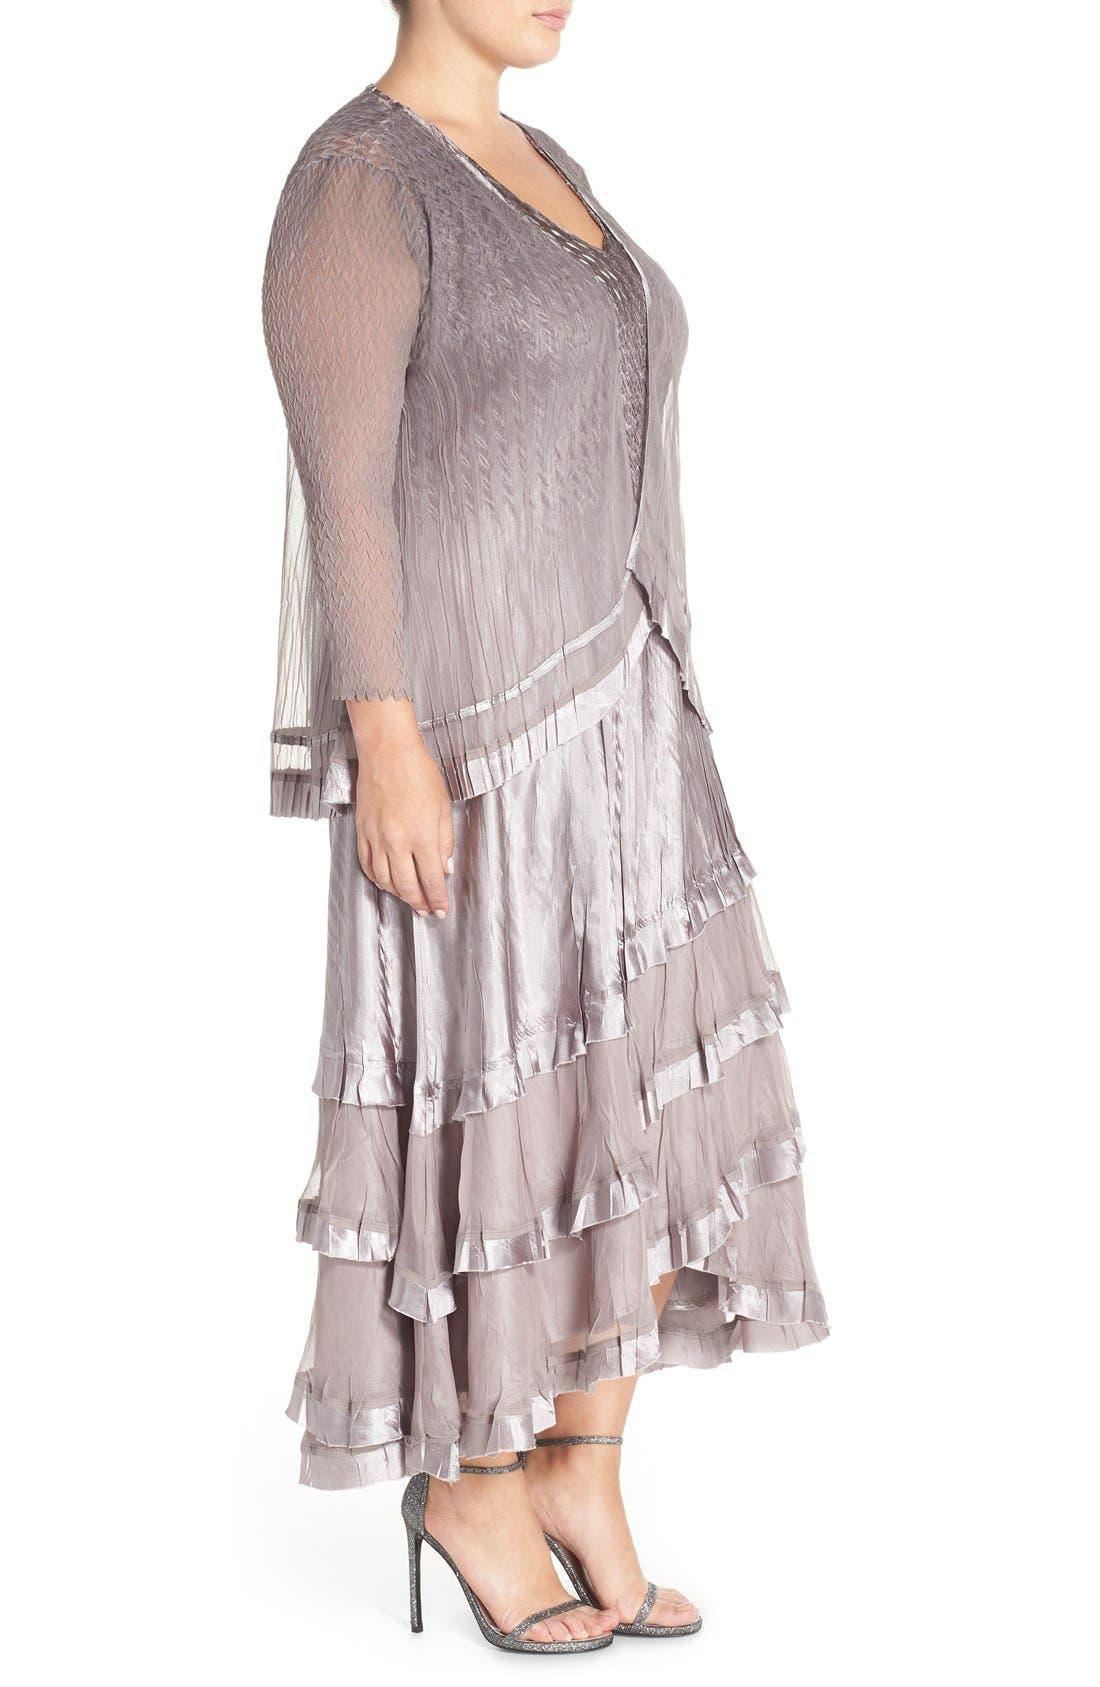 KOMAROV, Charmeuse Tiered Hem Dress with Chiffon Jacket, Alternate thumbnail 6, color, OYSTER SMOKE OMBRE